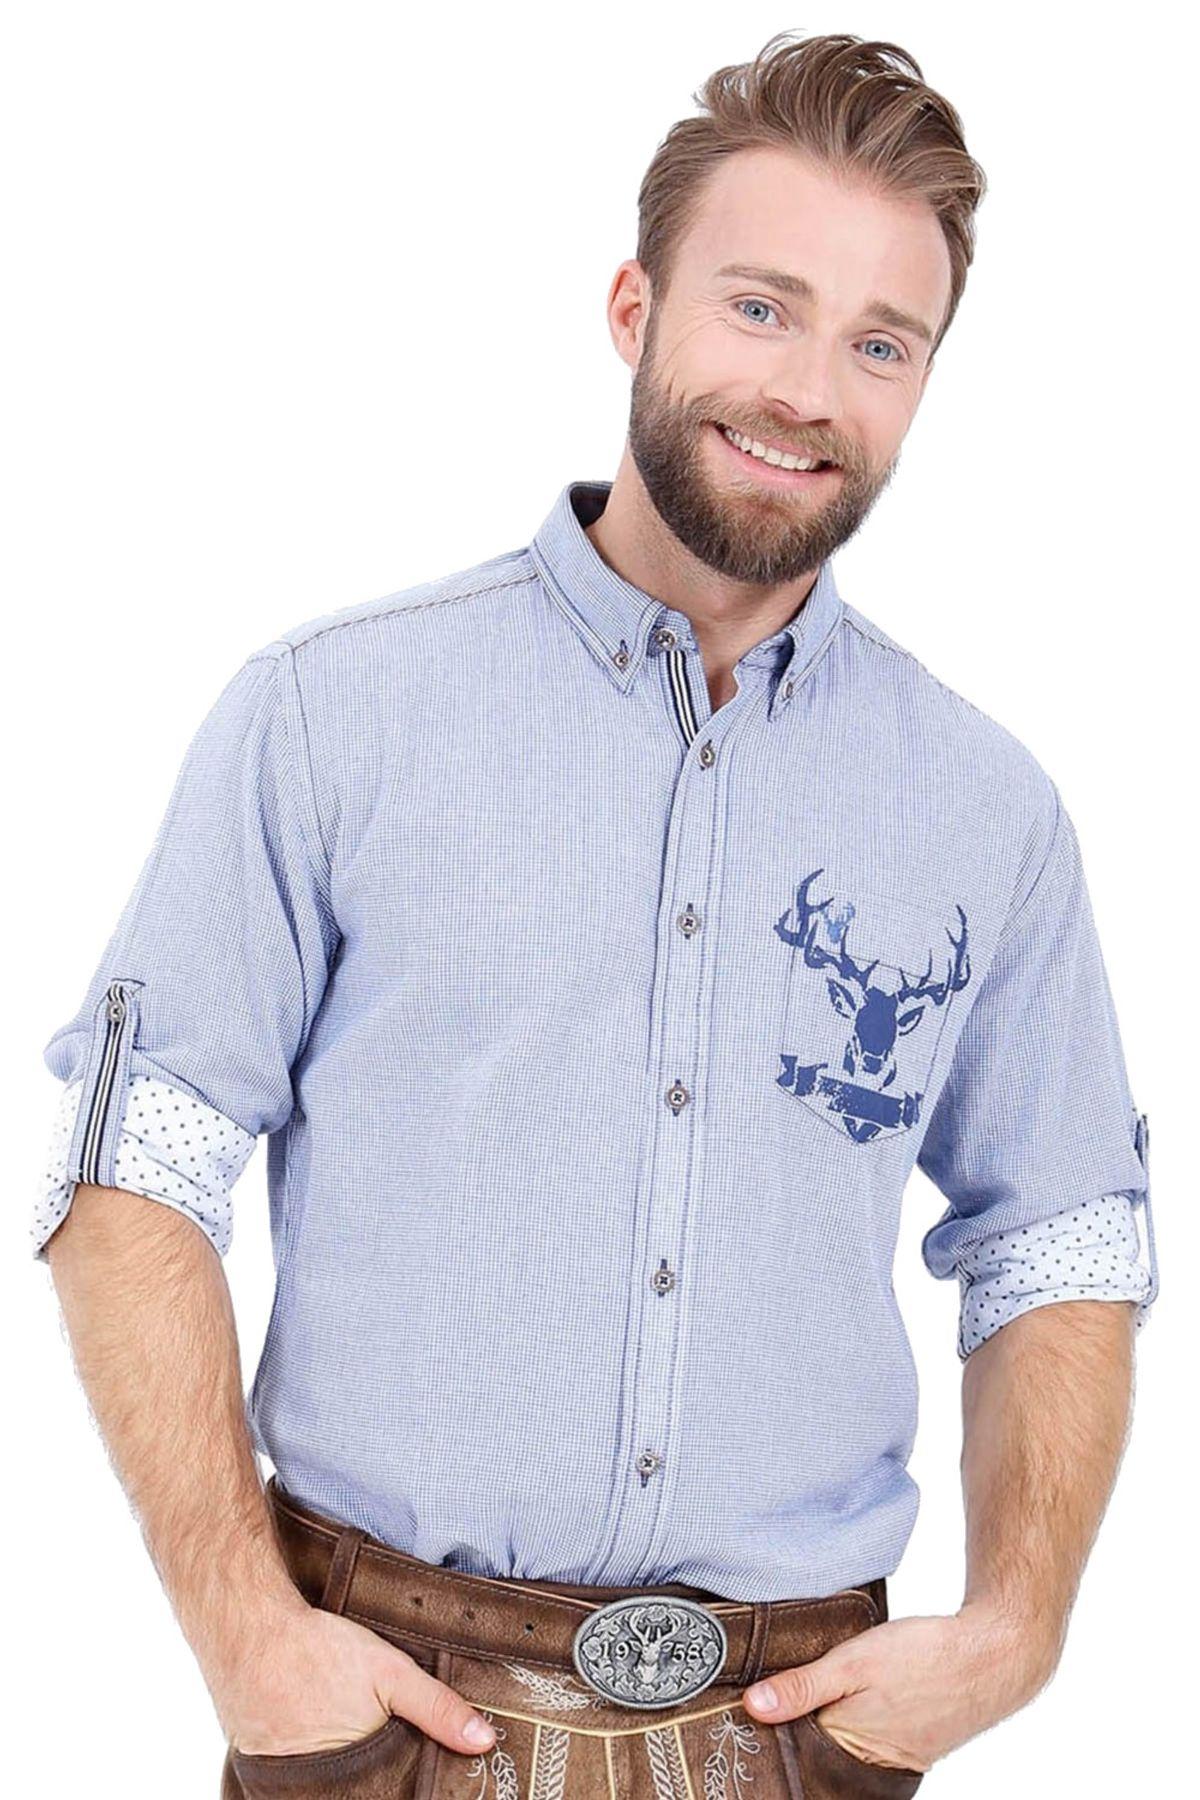 Krüger - Herren Trachtenhemd in Blau kariert, Erik (95105-8) – Bild 1